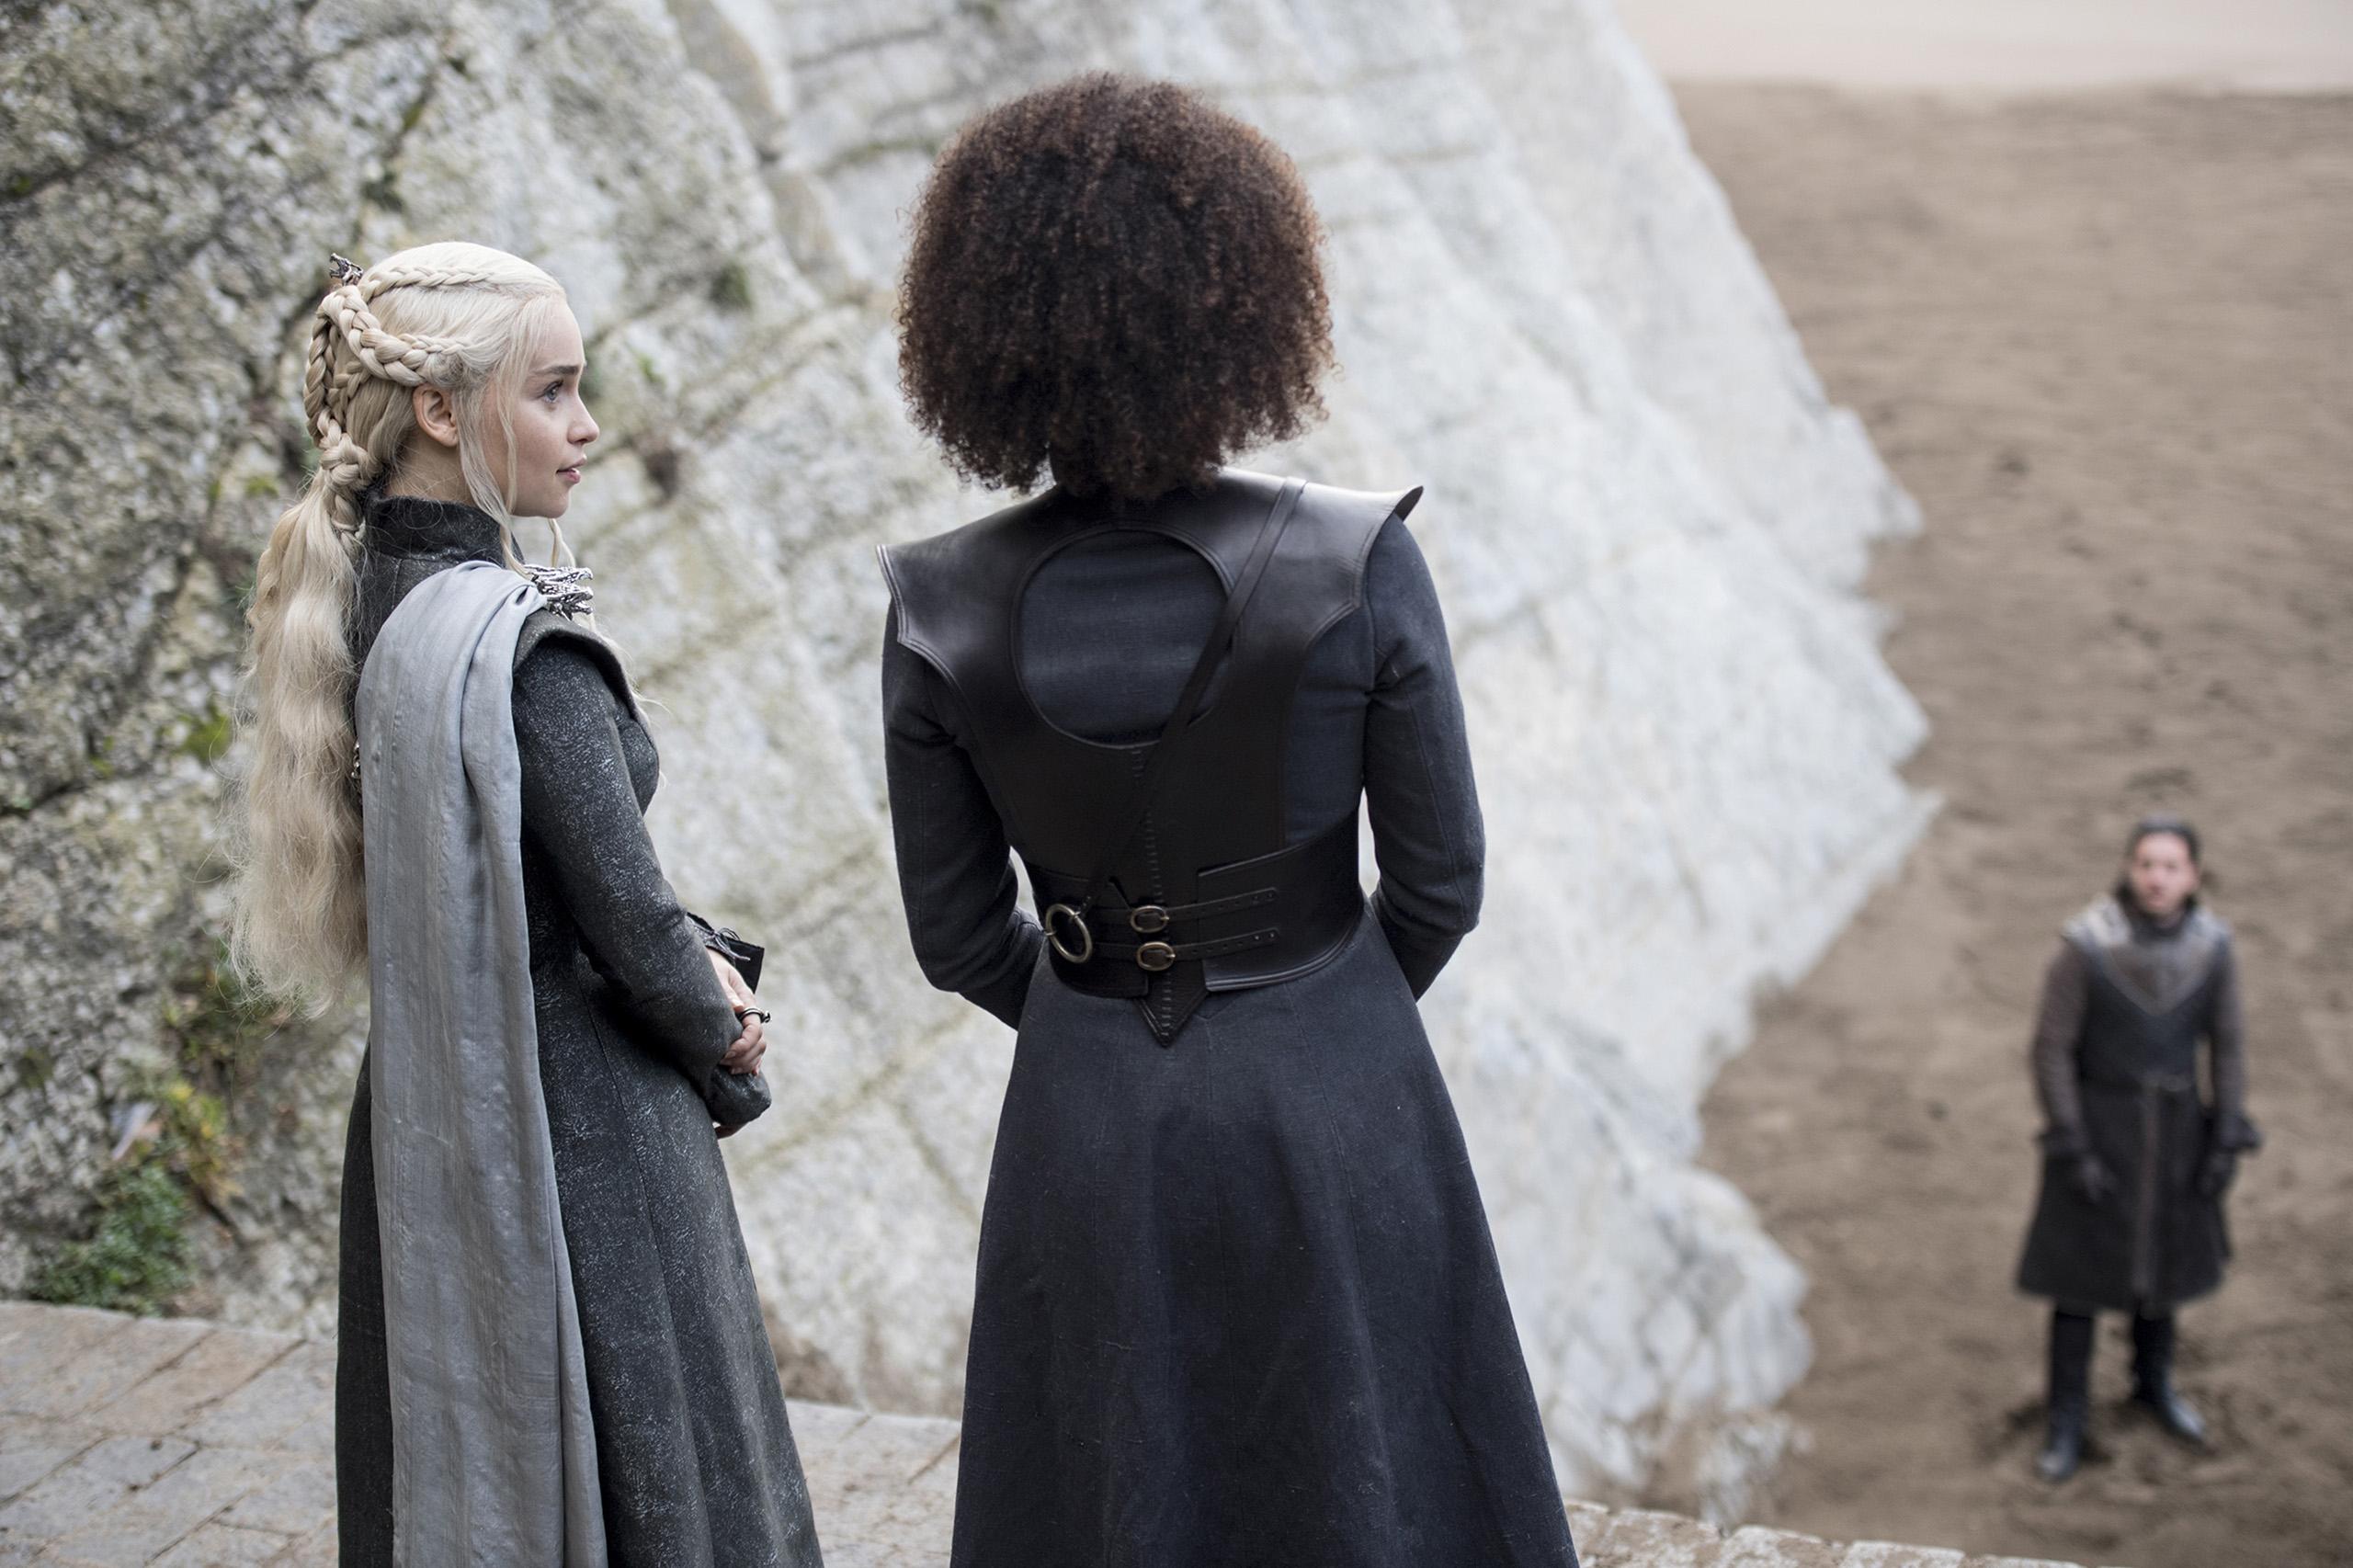 Emilia Clarke, Nathalie Emmanuel and Kit Harington in Game of Thrones